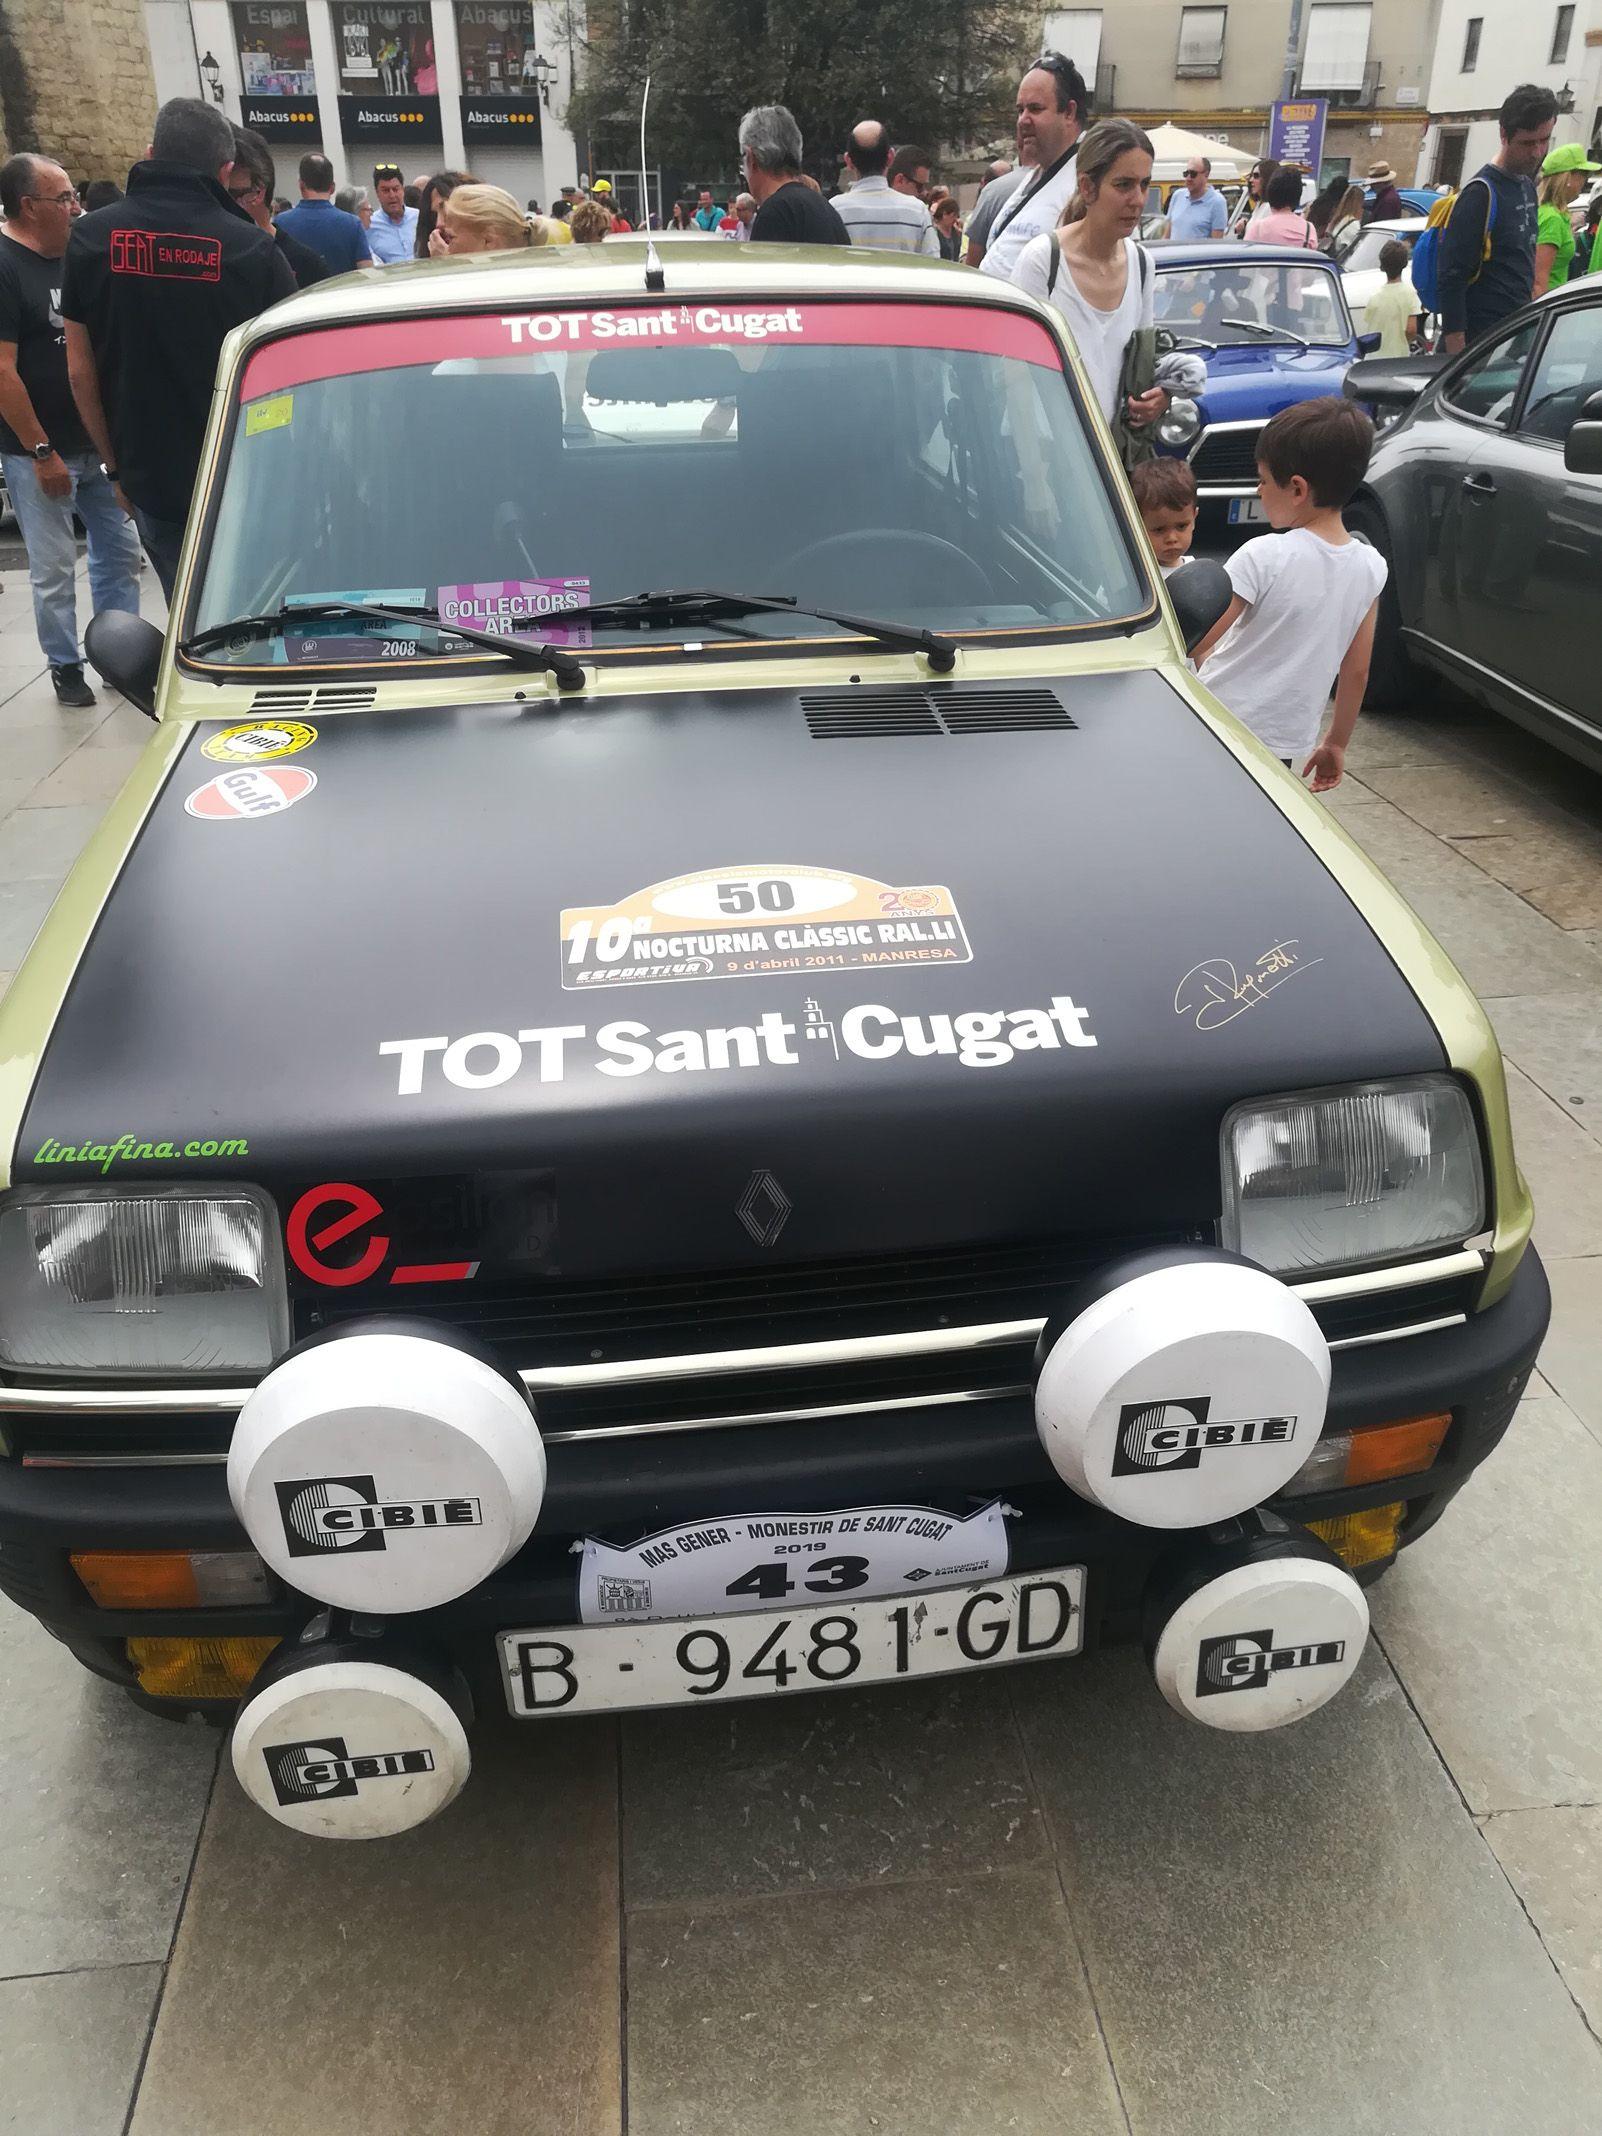 Julio Baeta   Rally Cotxes Antics de Más Gener a Pl. Octavia   Zem Pavello 1 Rambla del Celler